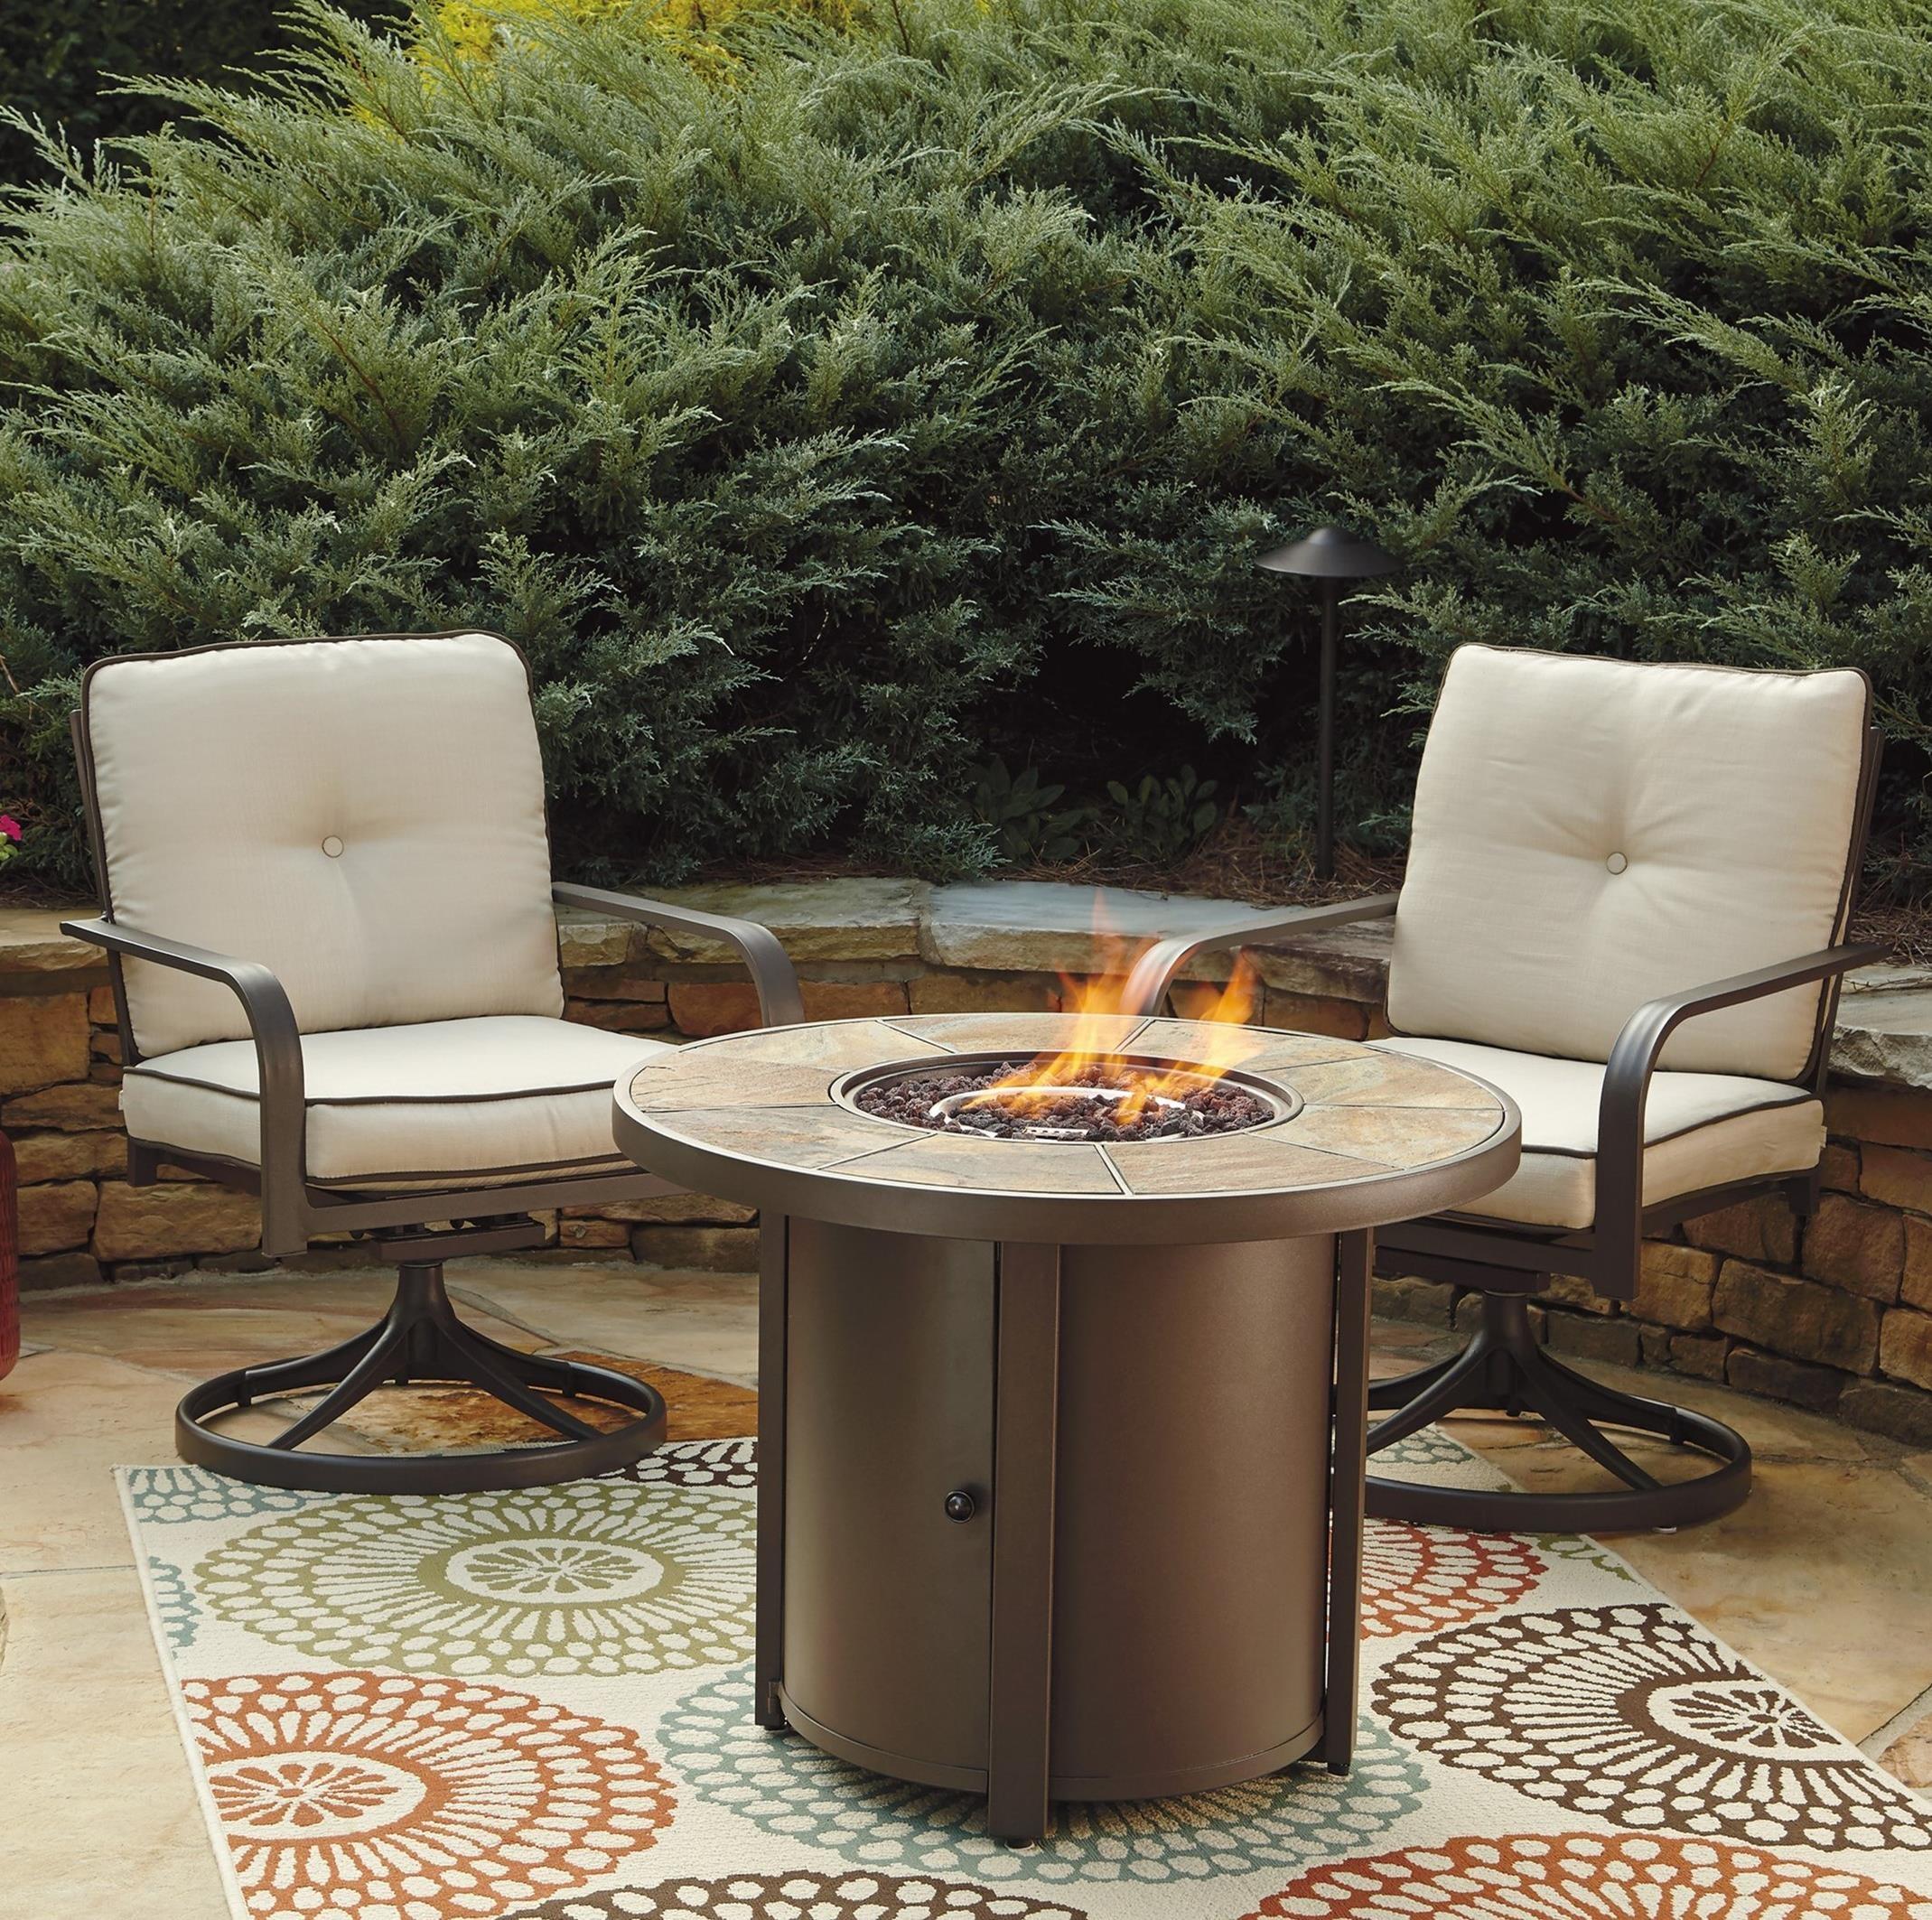 atlantic 3 piece round fire pit table set w swivel lounge